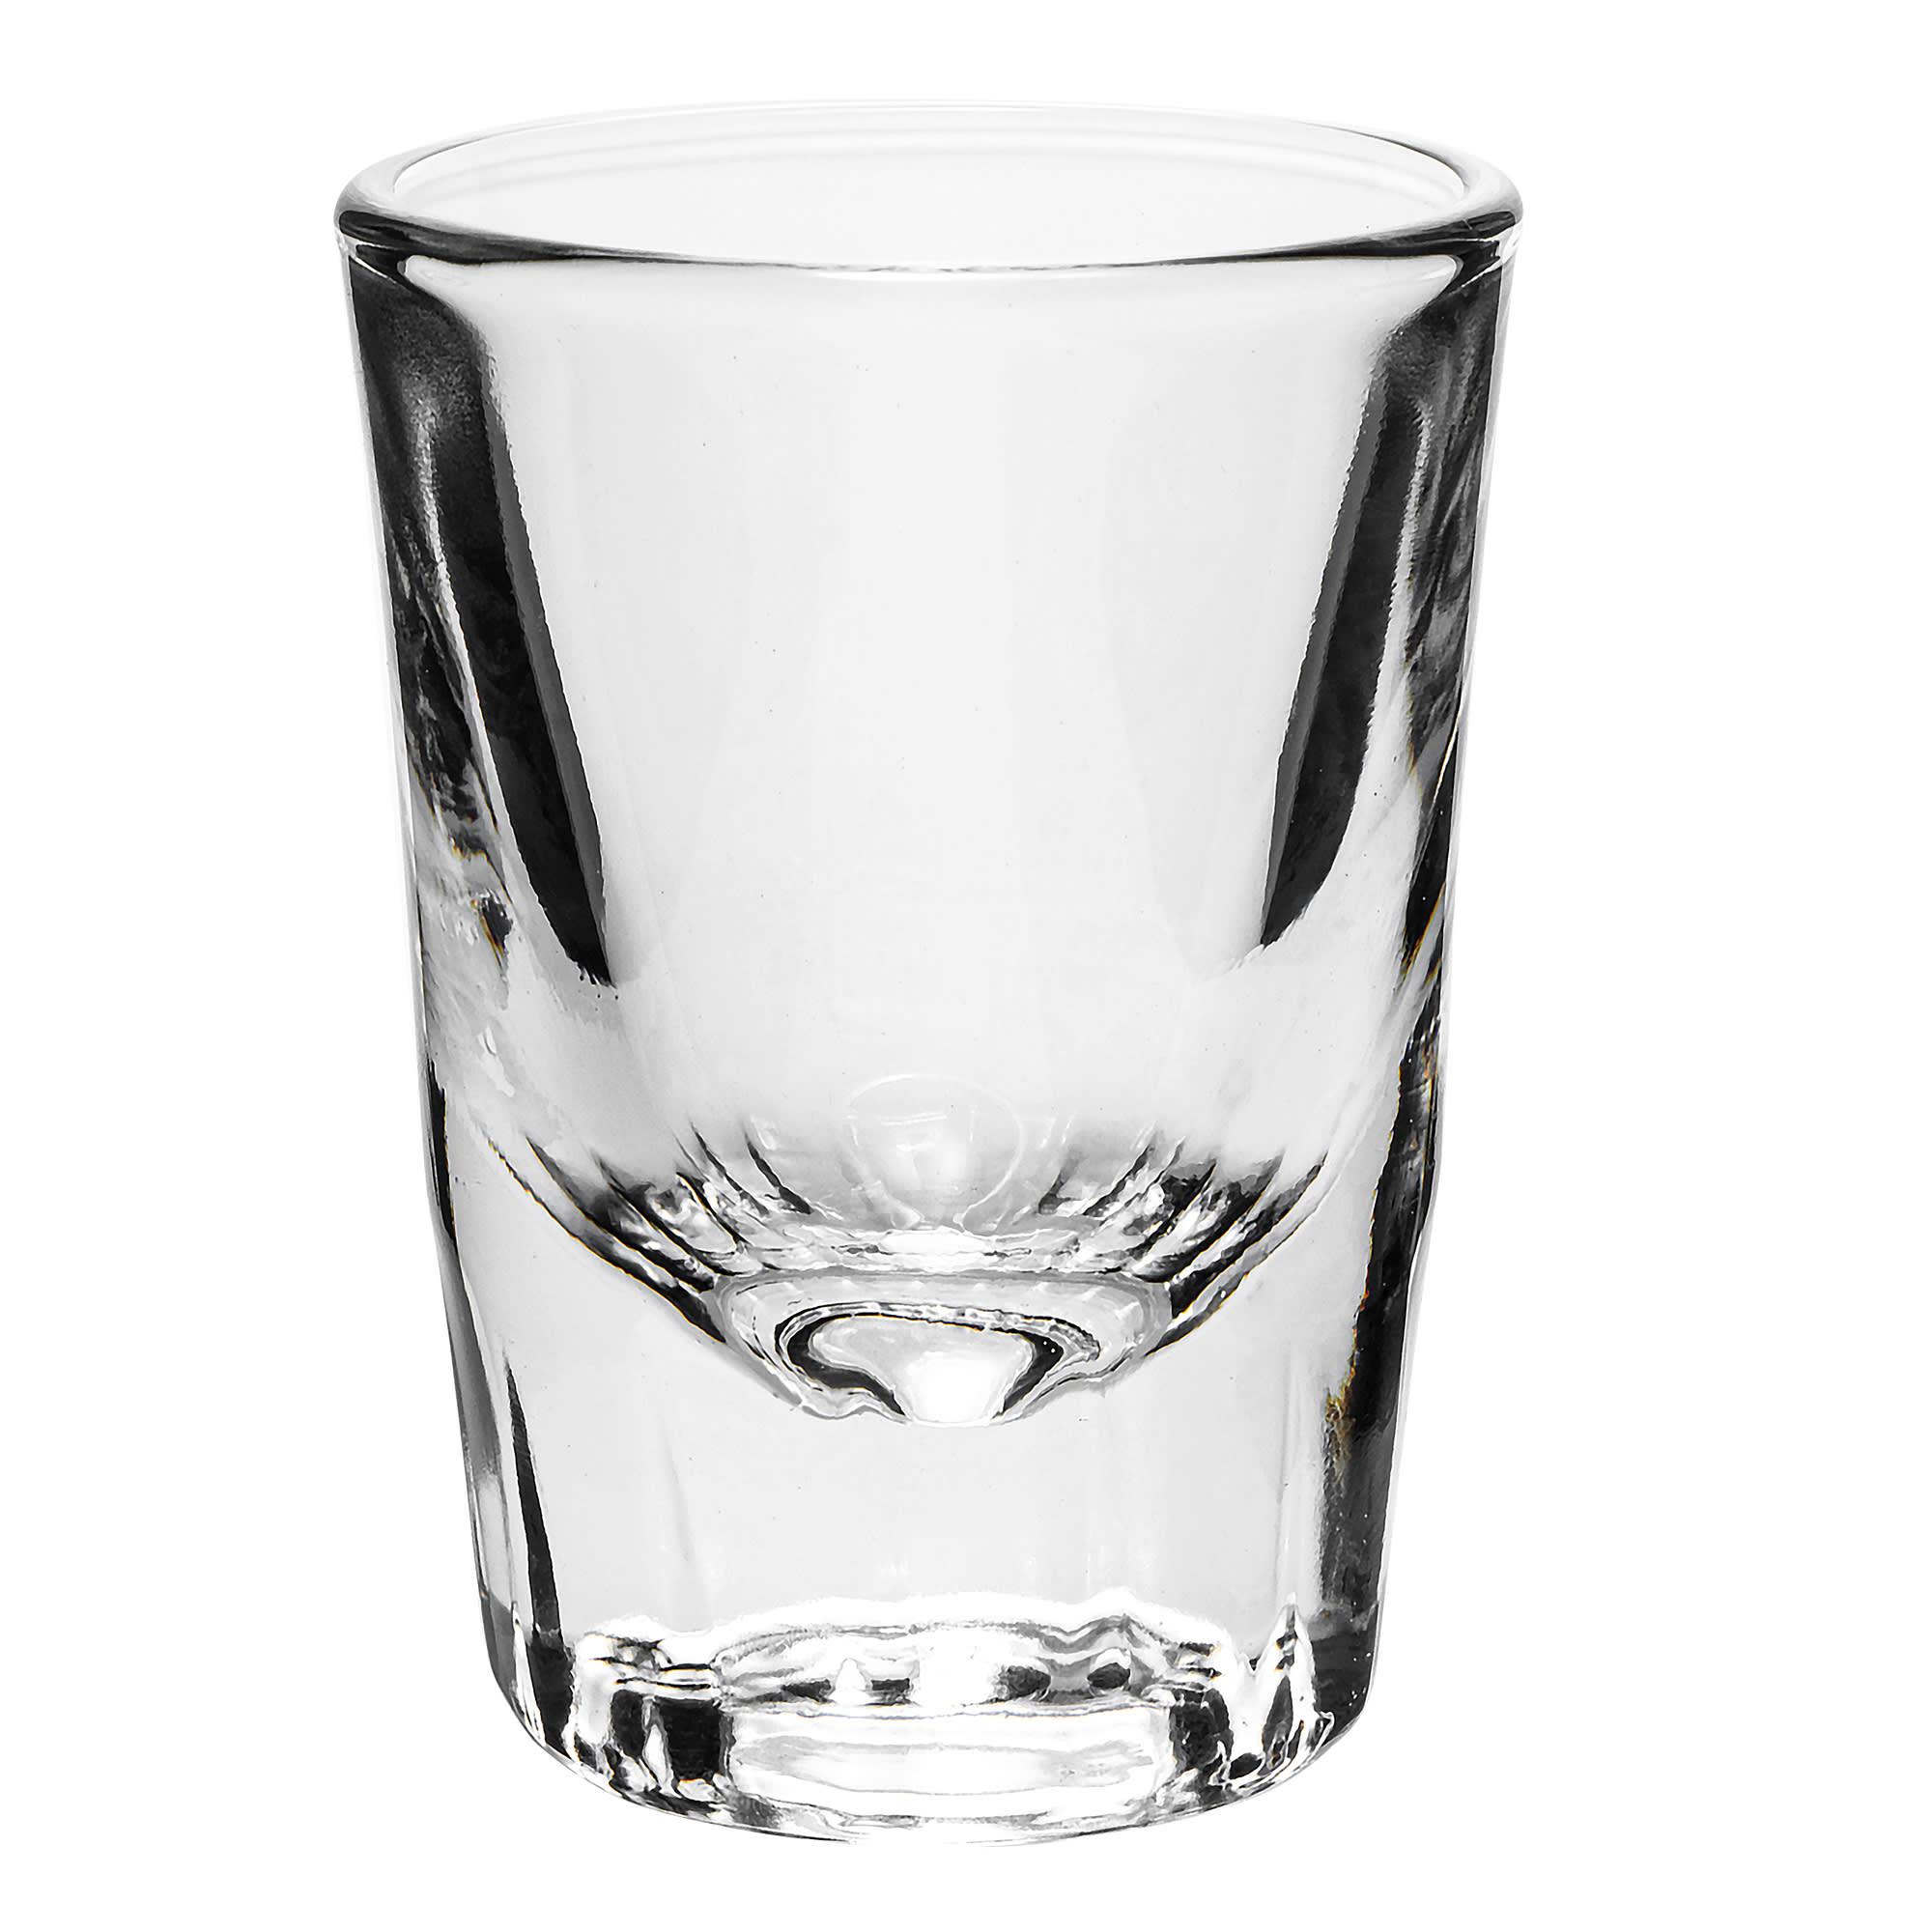 Libbey 5126 2-oz Fluted Shot Glass